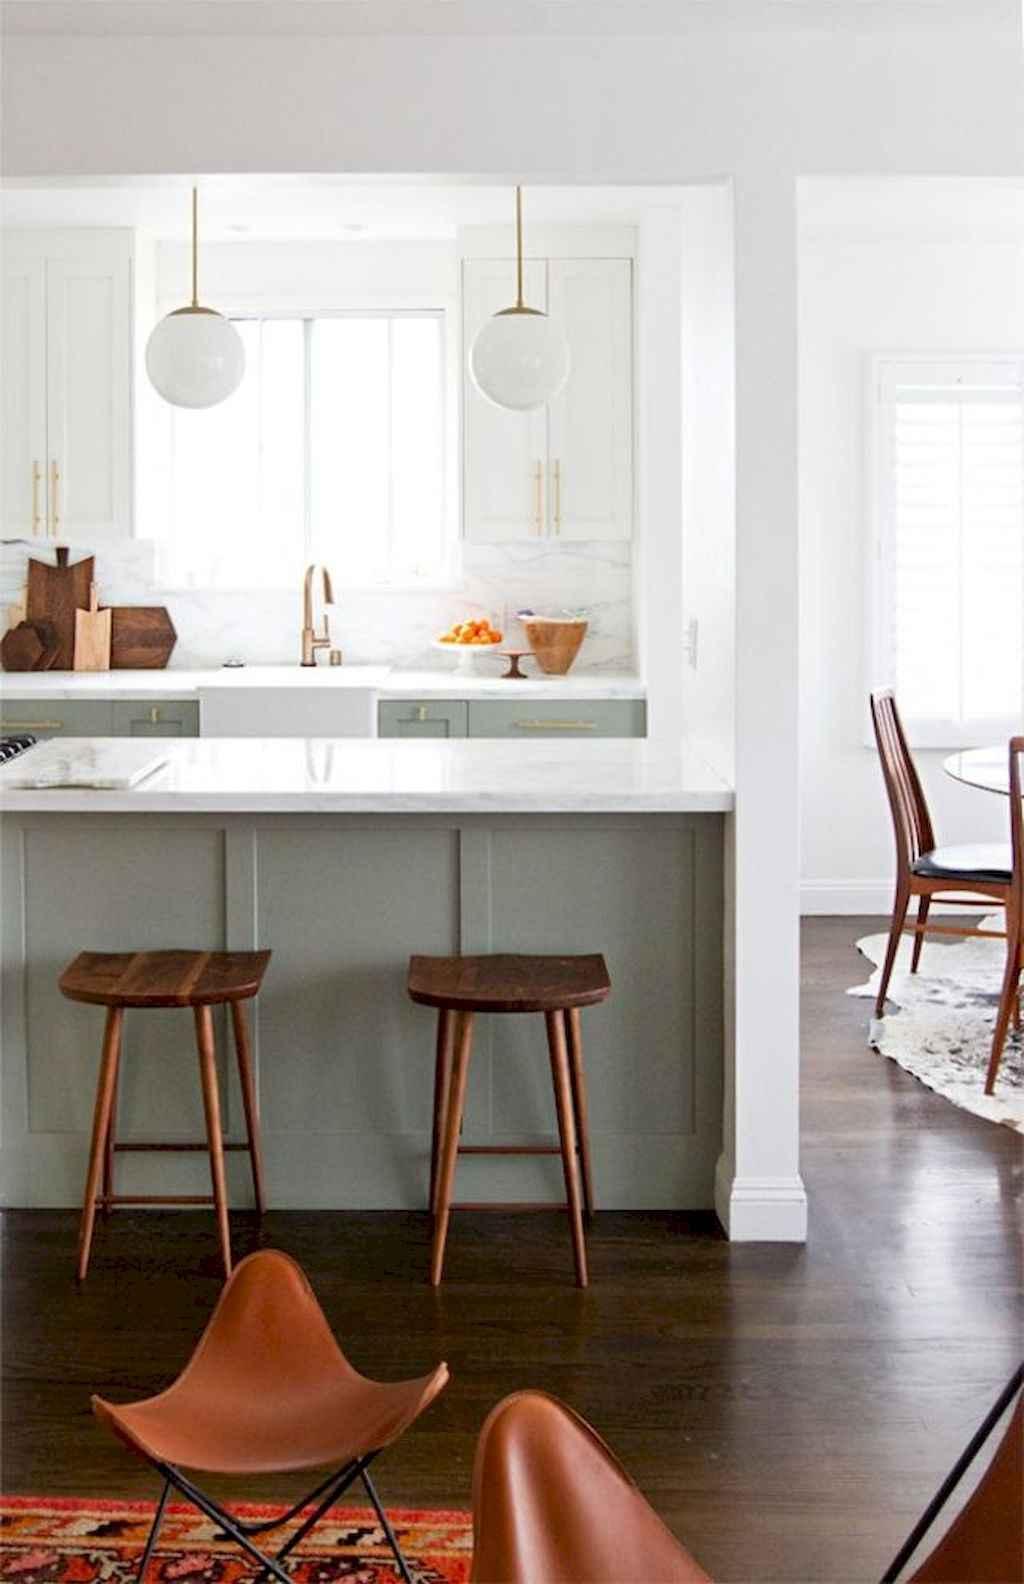 Mid century modern kitchen design ideas (18)